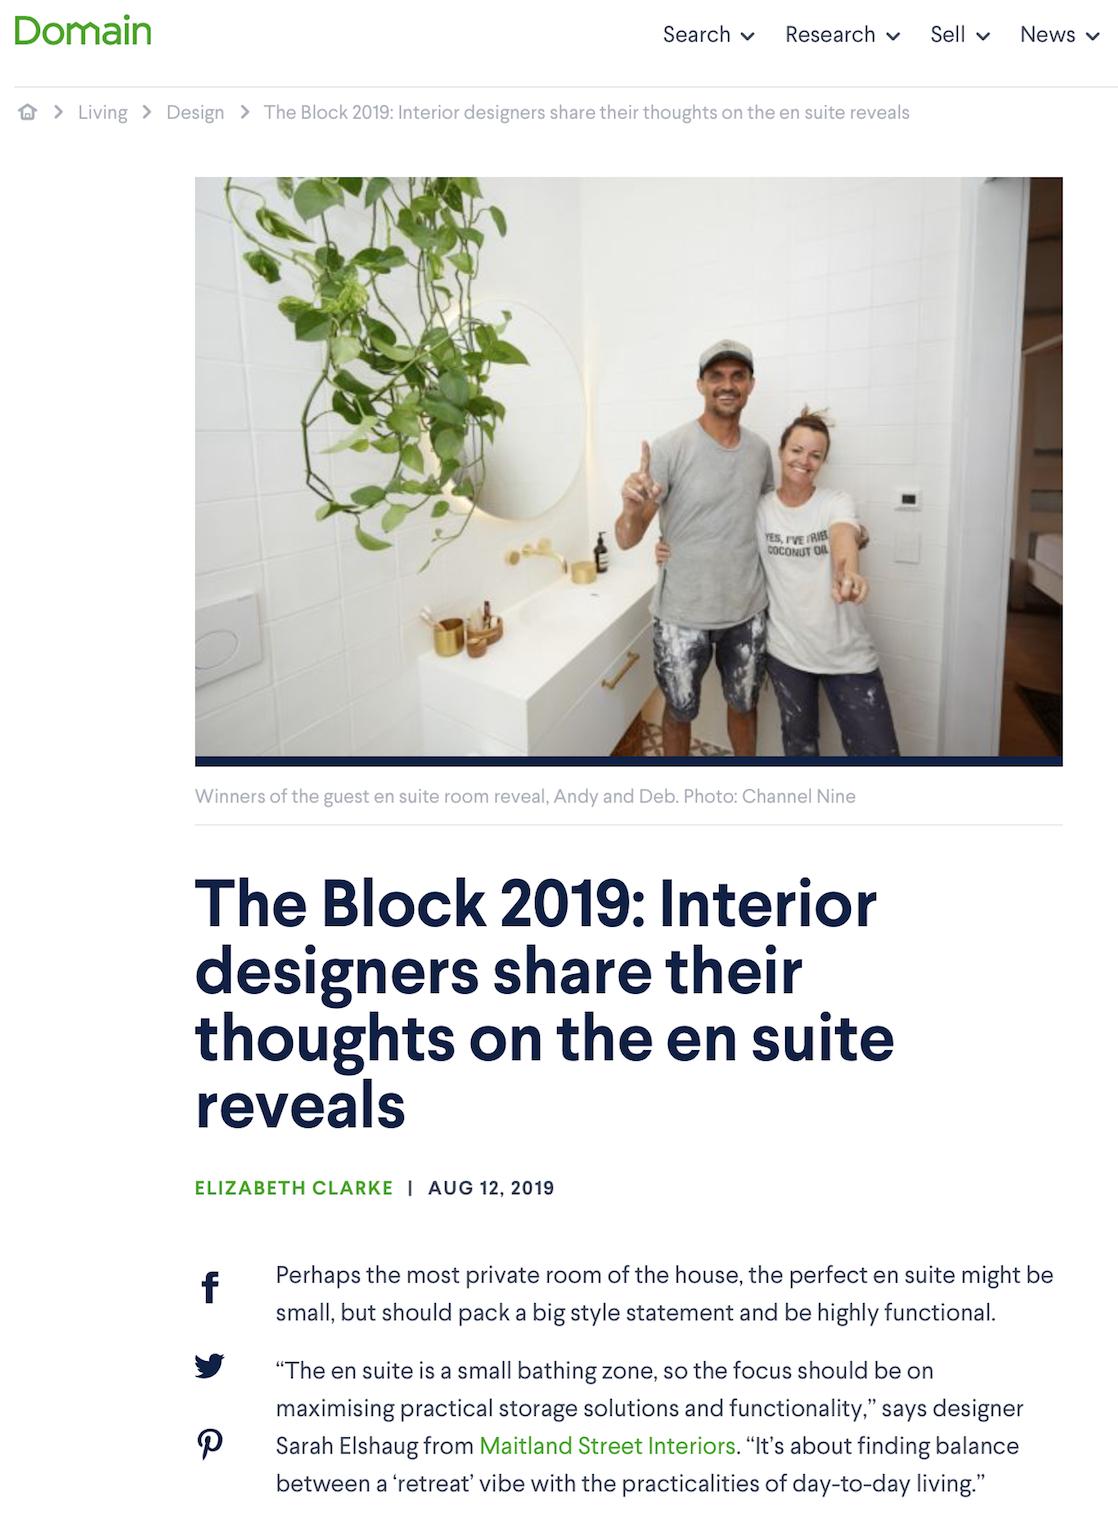 Sarah Elshaug, Maitland Street Interiors, The Block 2019, Elizabeth Clarke, Maitland Street Interiors, Ensuite Design